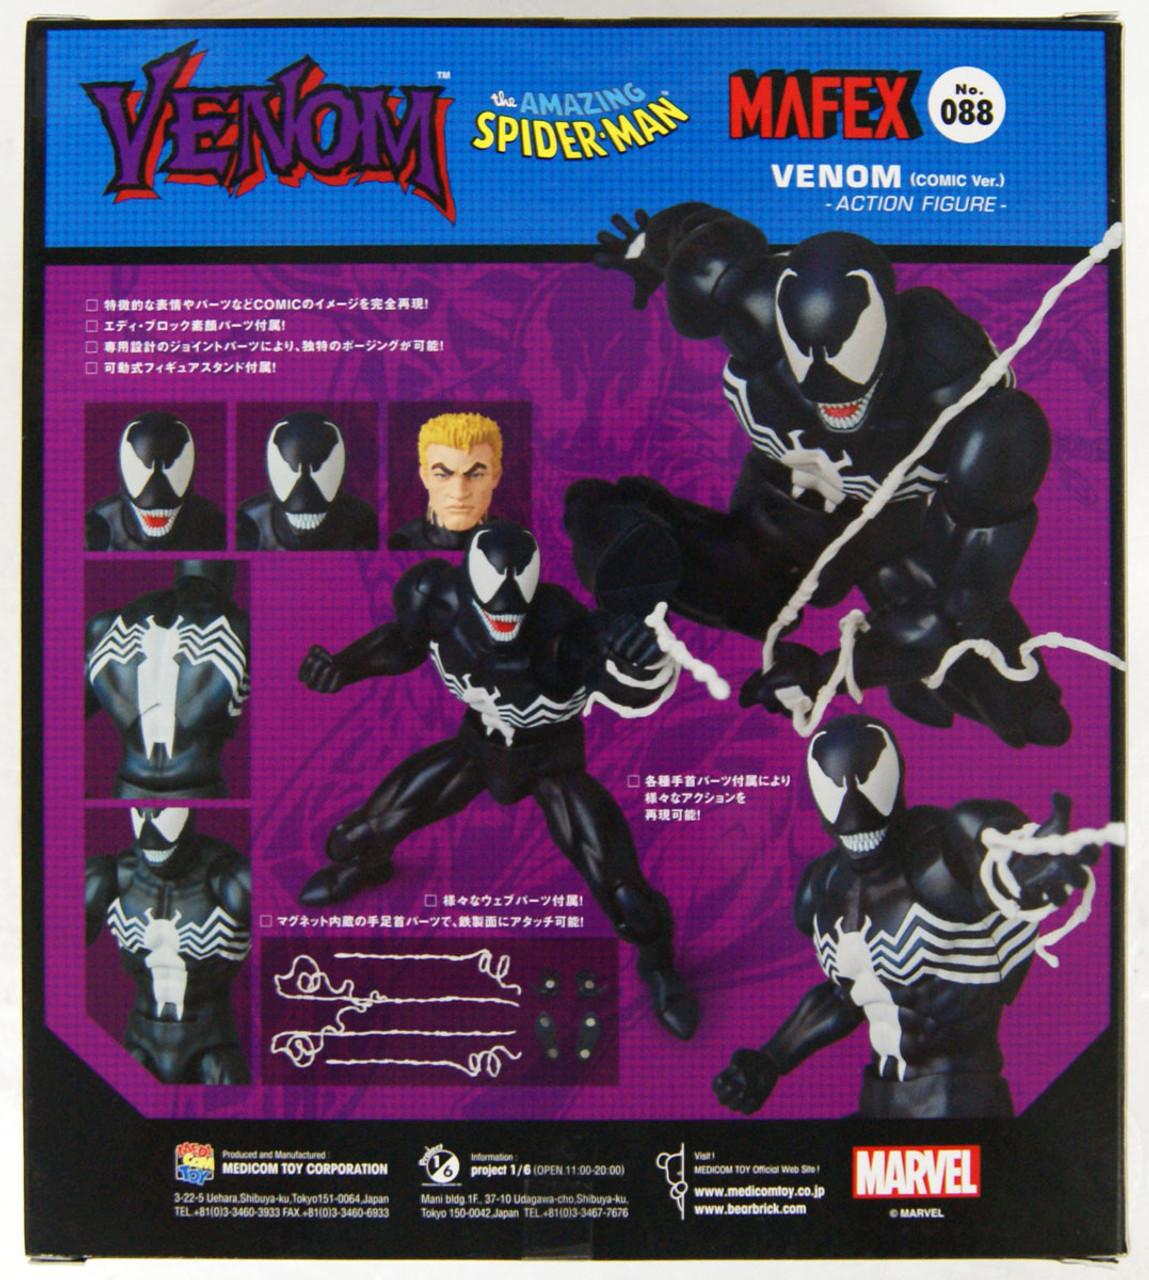 Marvel Gurihiru Venom Plush Tracking number Japan from